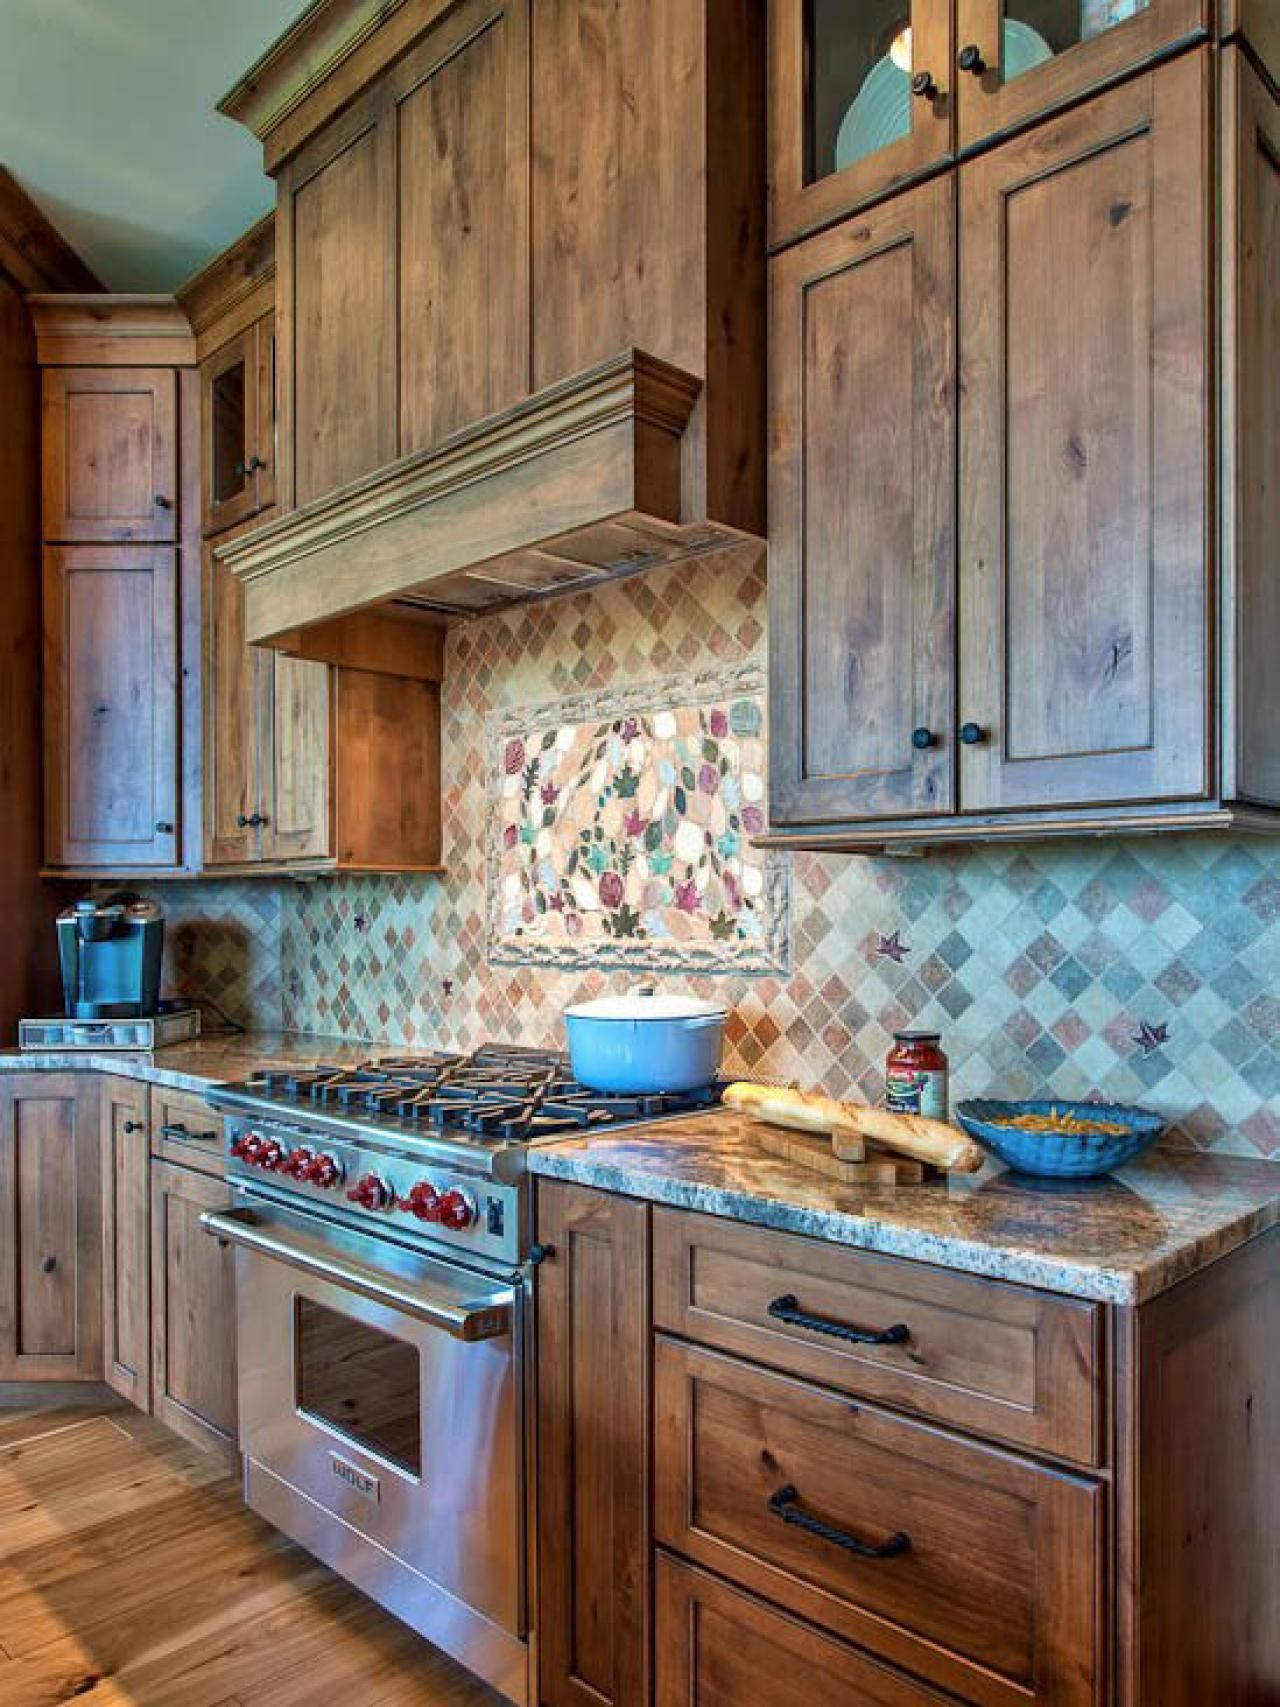 beautiful rustic cabinets rustic kitchen cabinets industrial decor kitchen rustic kitchen on kitchen cabinets rustic farmhouse style id=35045